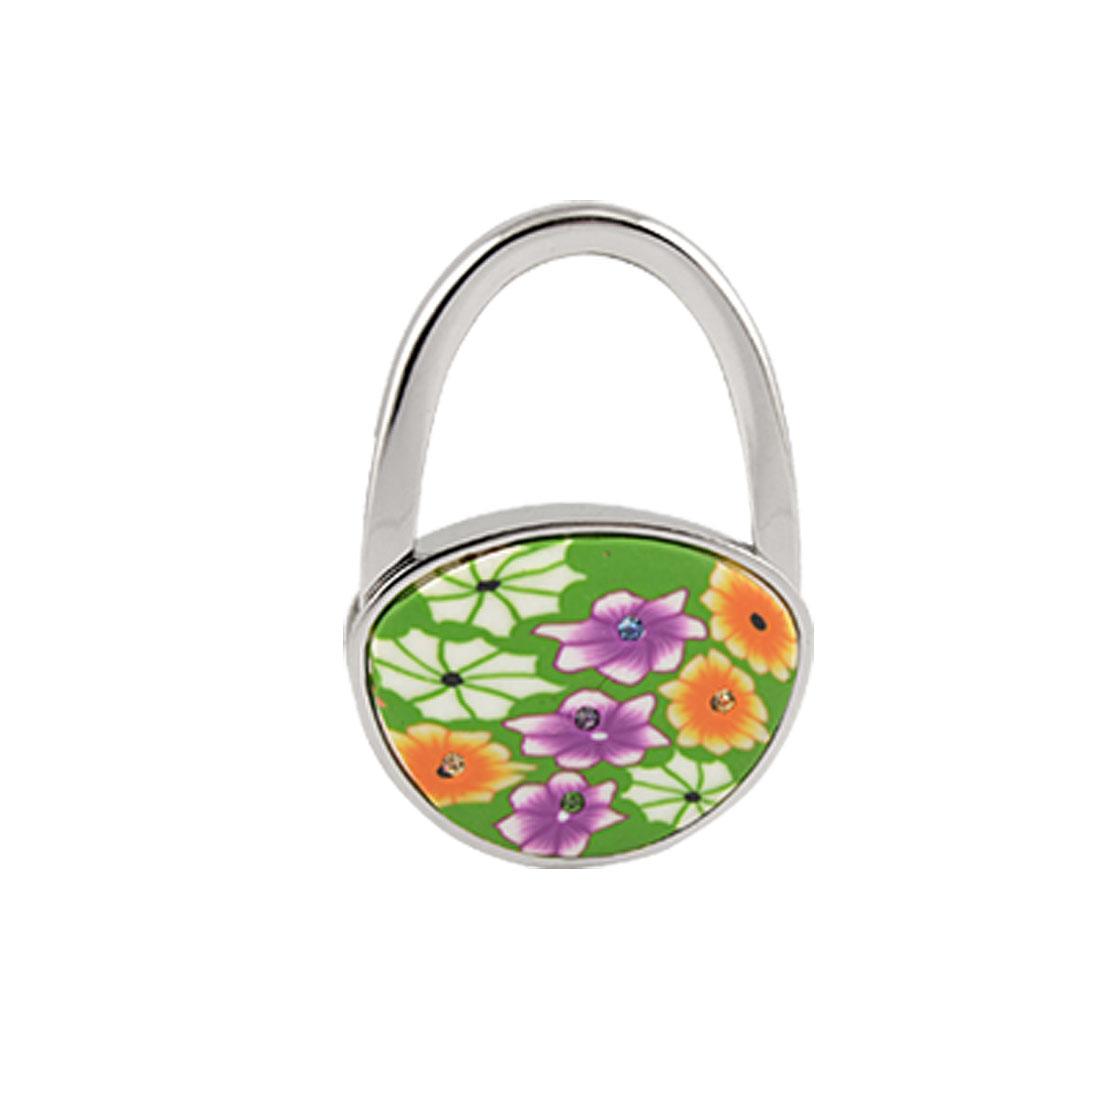 Multicolor Rhinestone Flower Accent Padlock Handbag Hook w Rubber Base